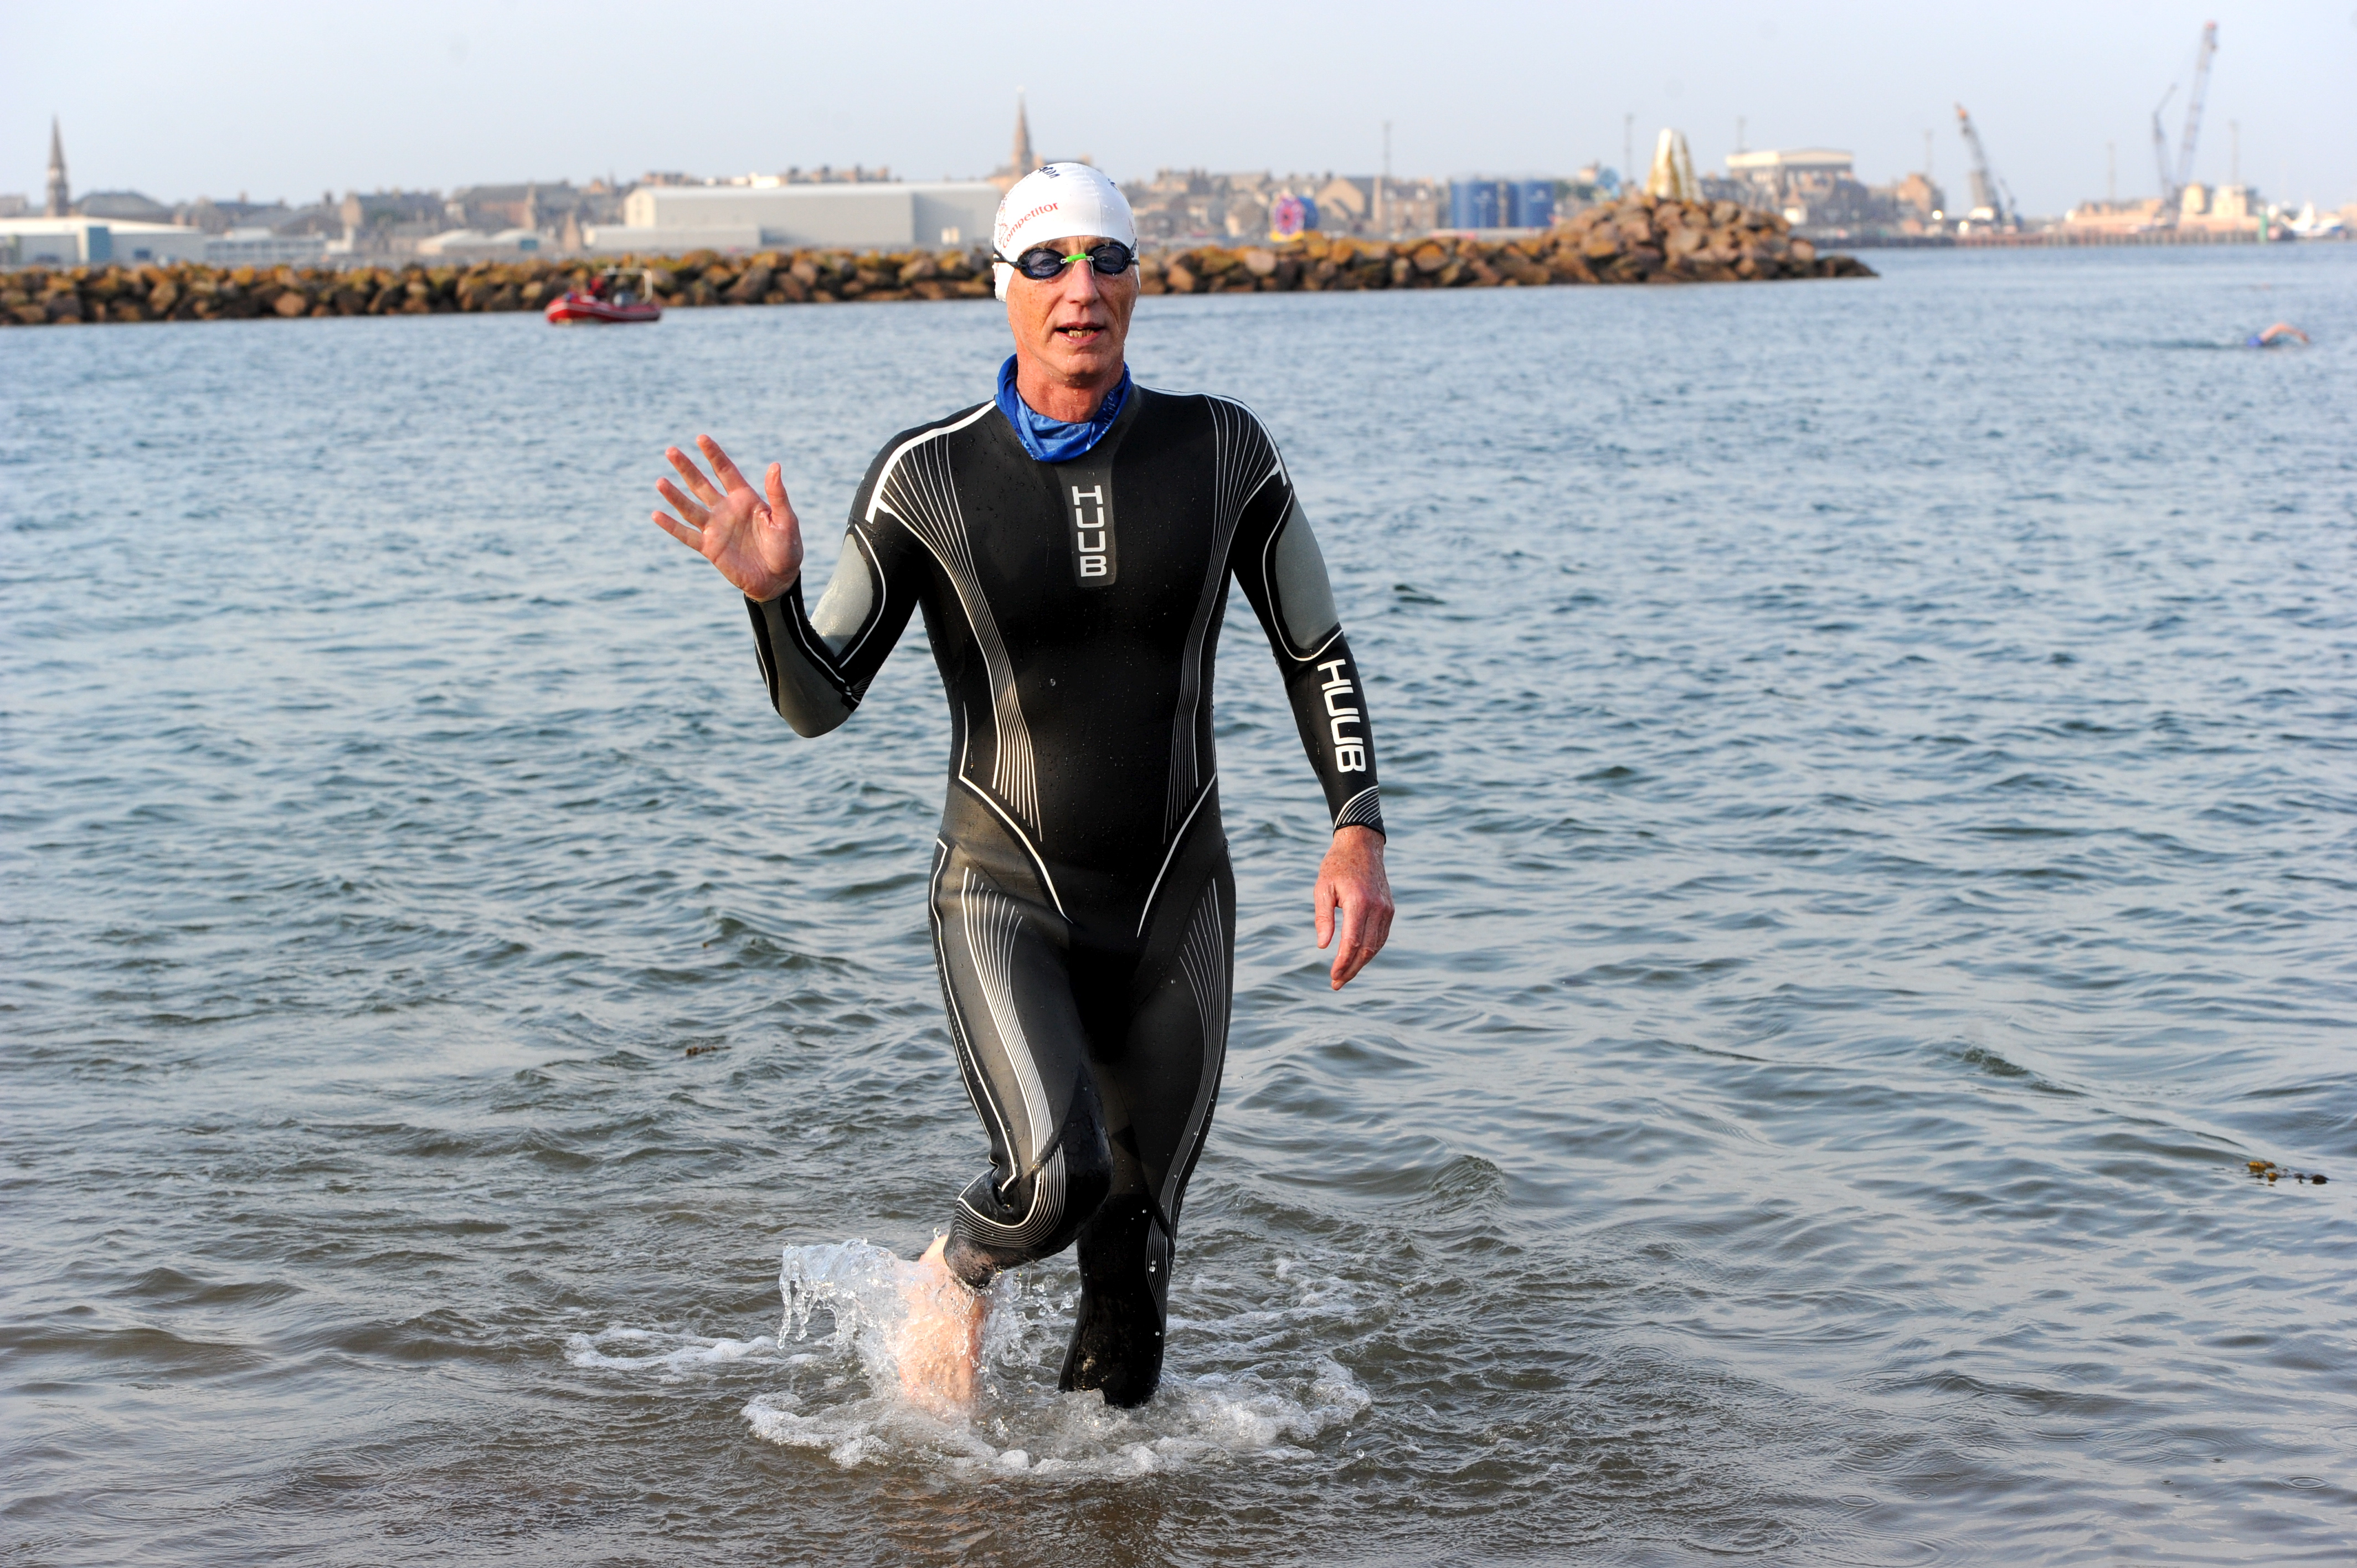 Swim winner, 68 year old Ian Milne.